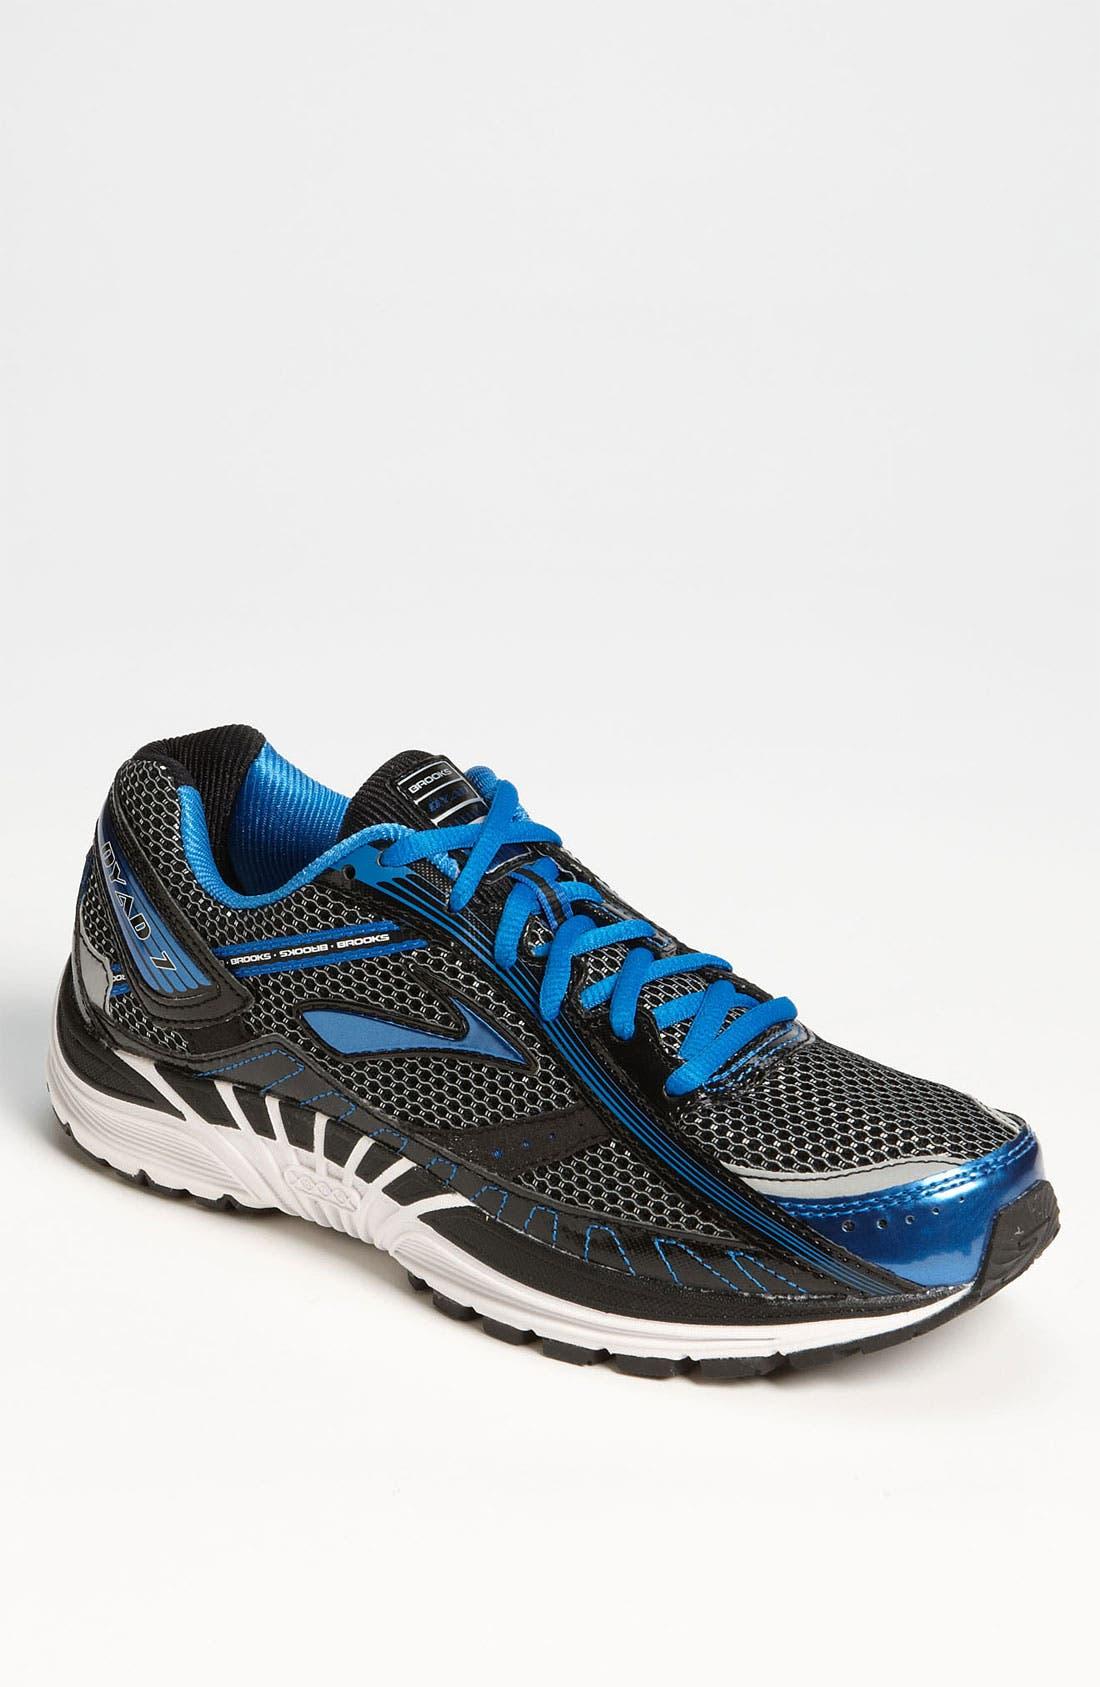 Alternate Image 1 Selected - Brooks 'DYAD 7' Running Shoe (Men)